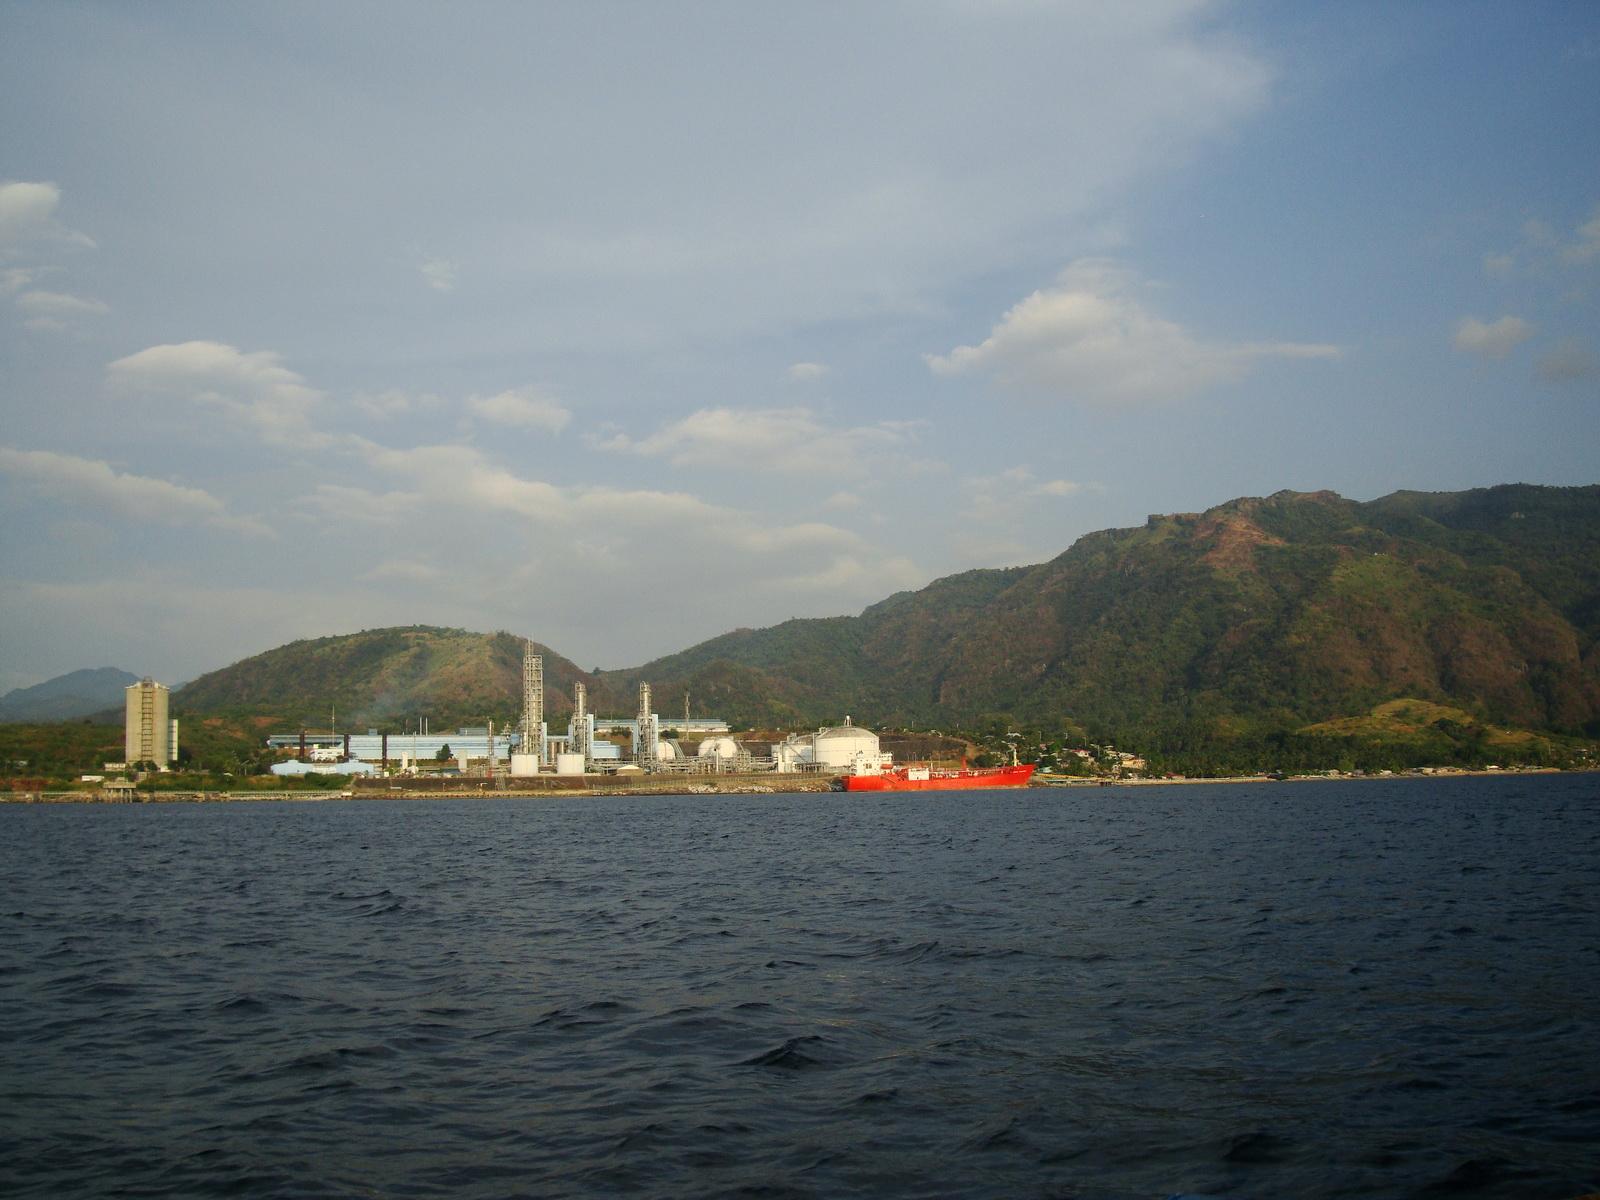 Batangas JG Summit Petrochemical Plant Anilao area Batangas 02